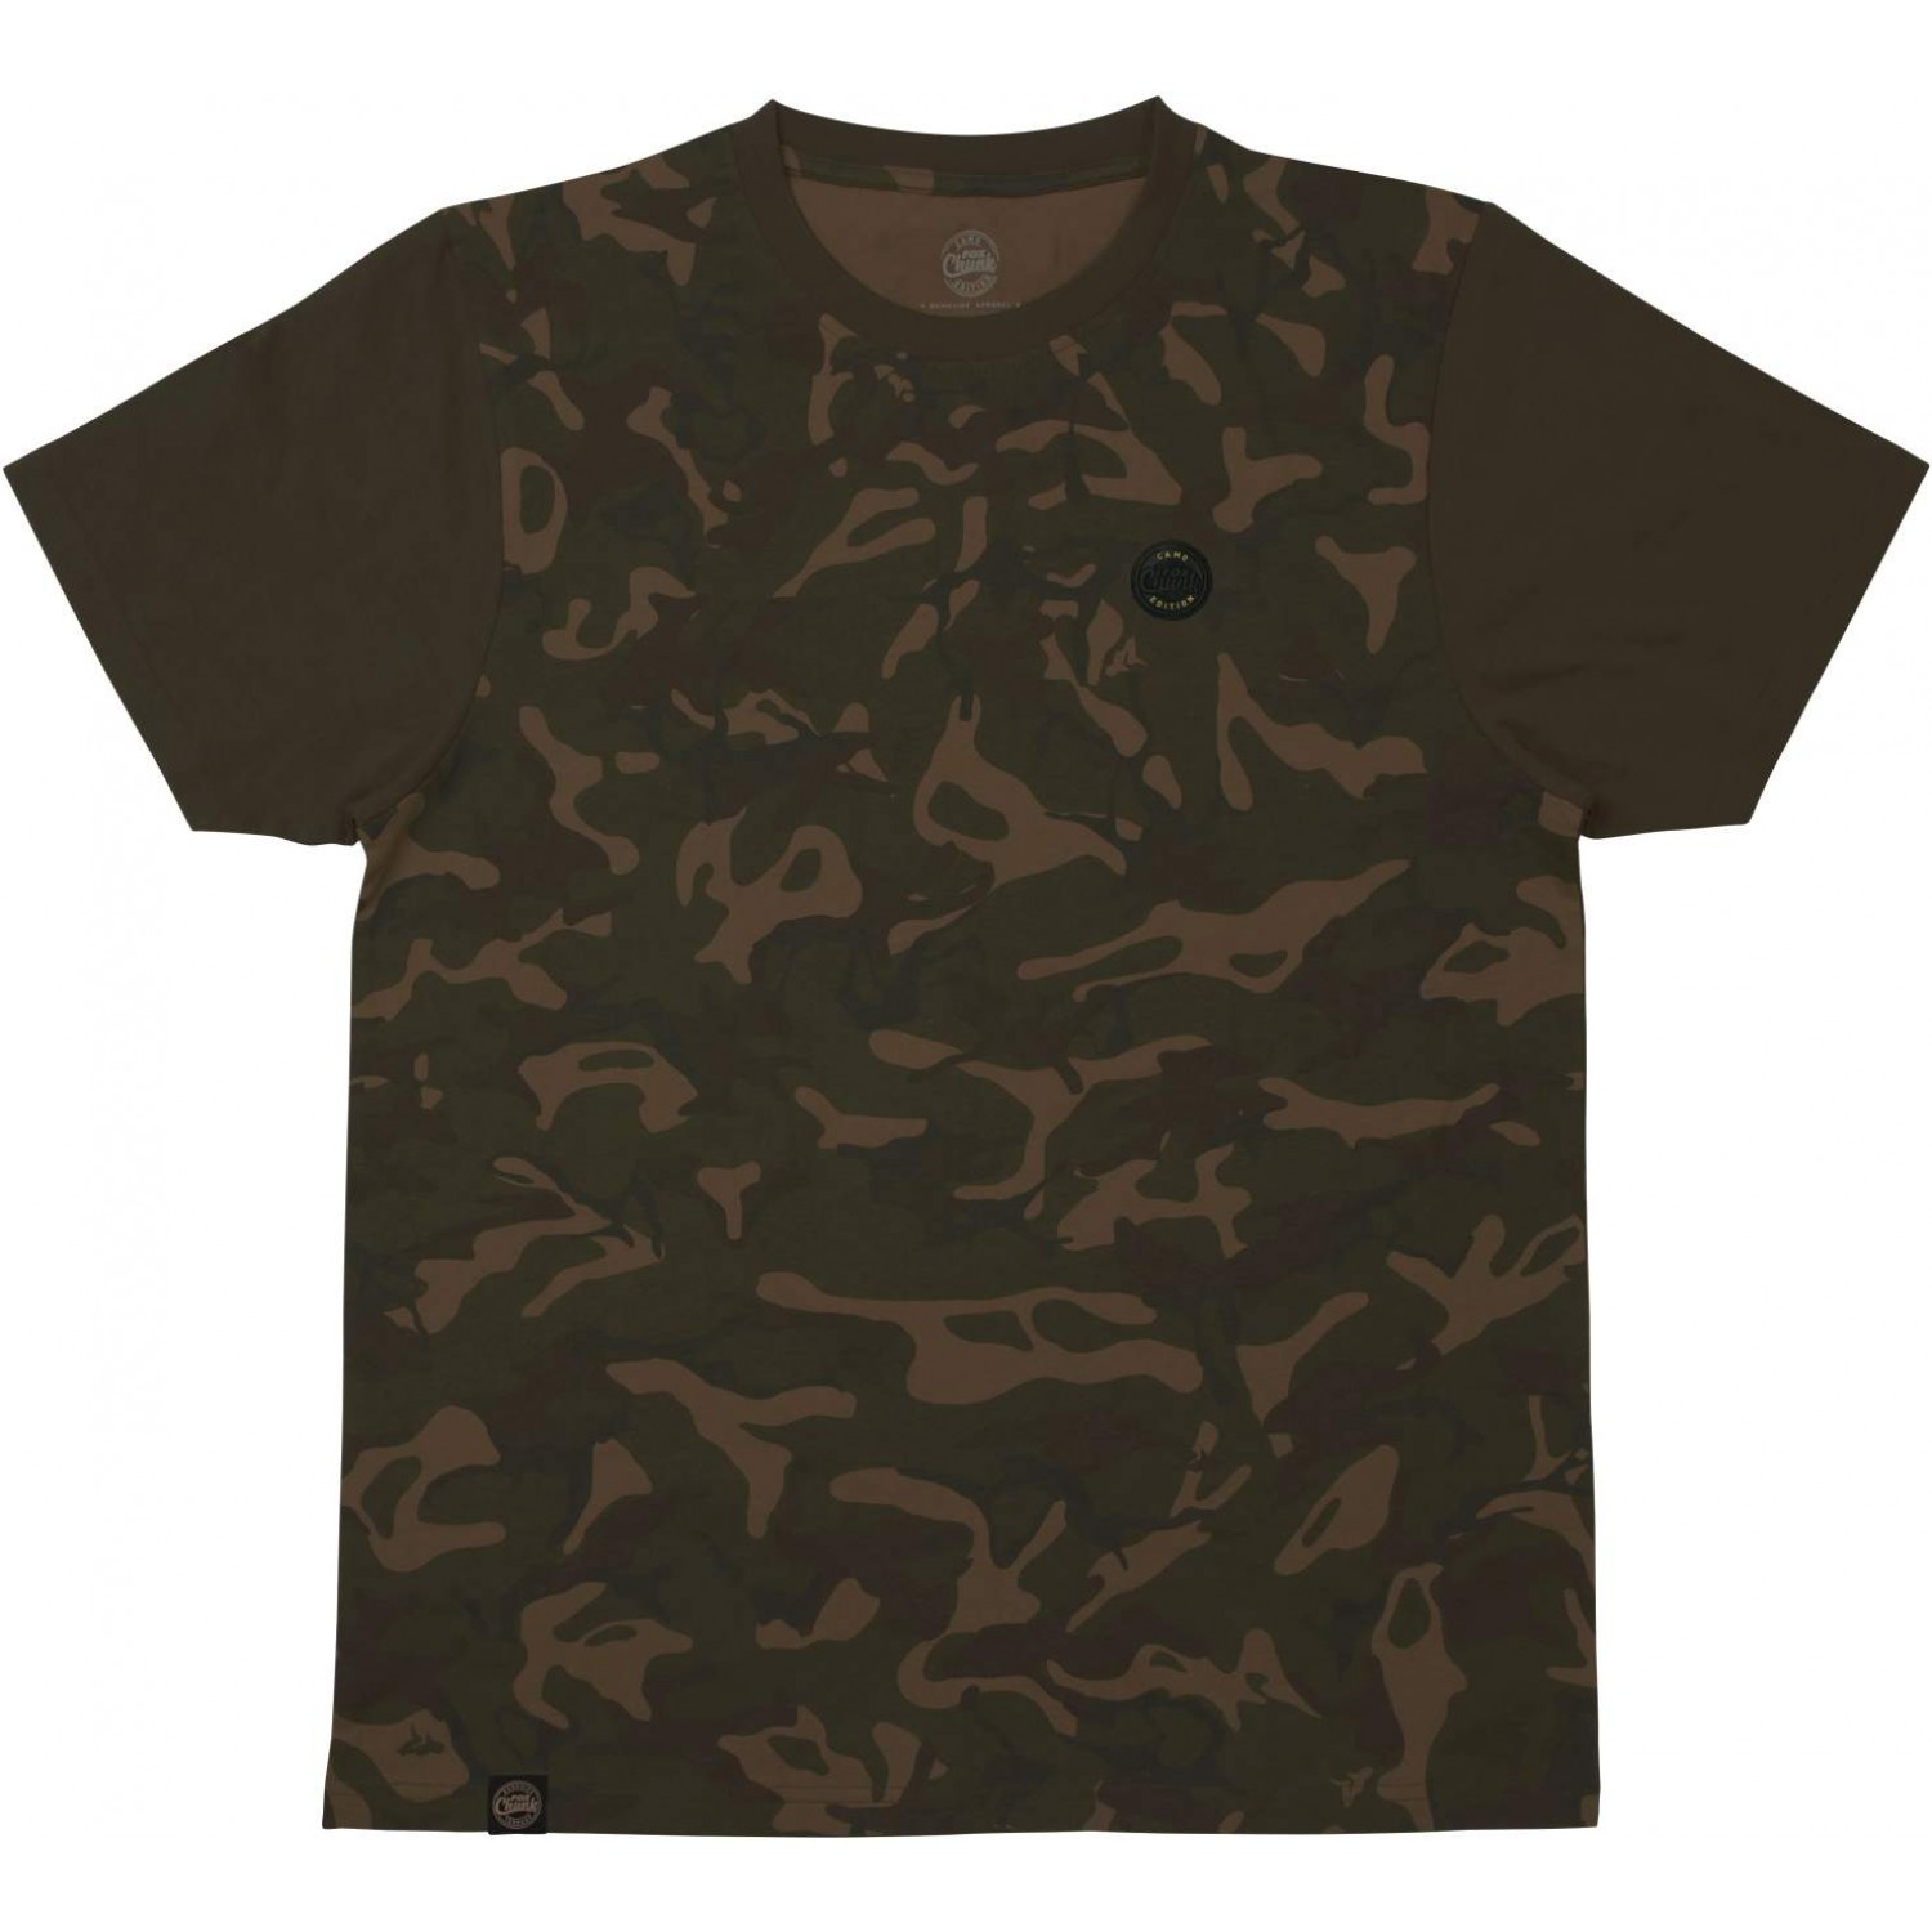 Chunk Classic T Shirt Orange Marl Fox Carp Fishing Clothing